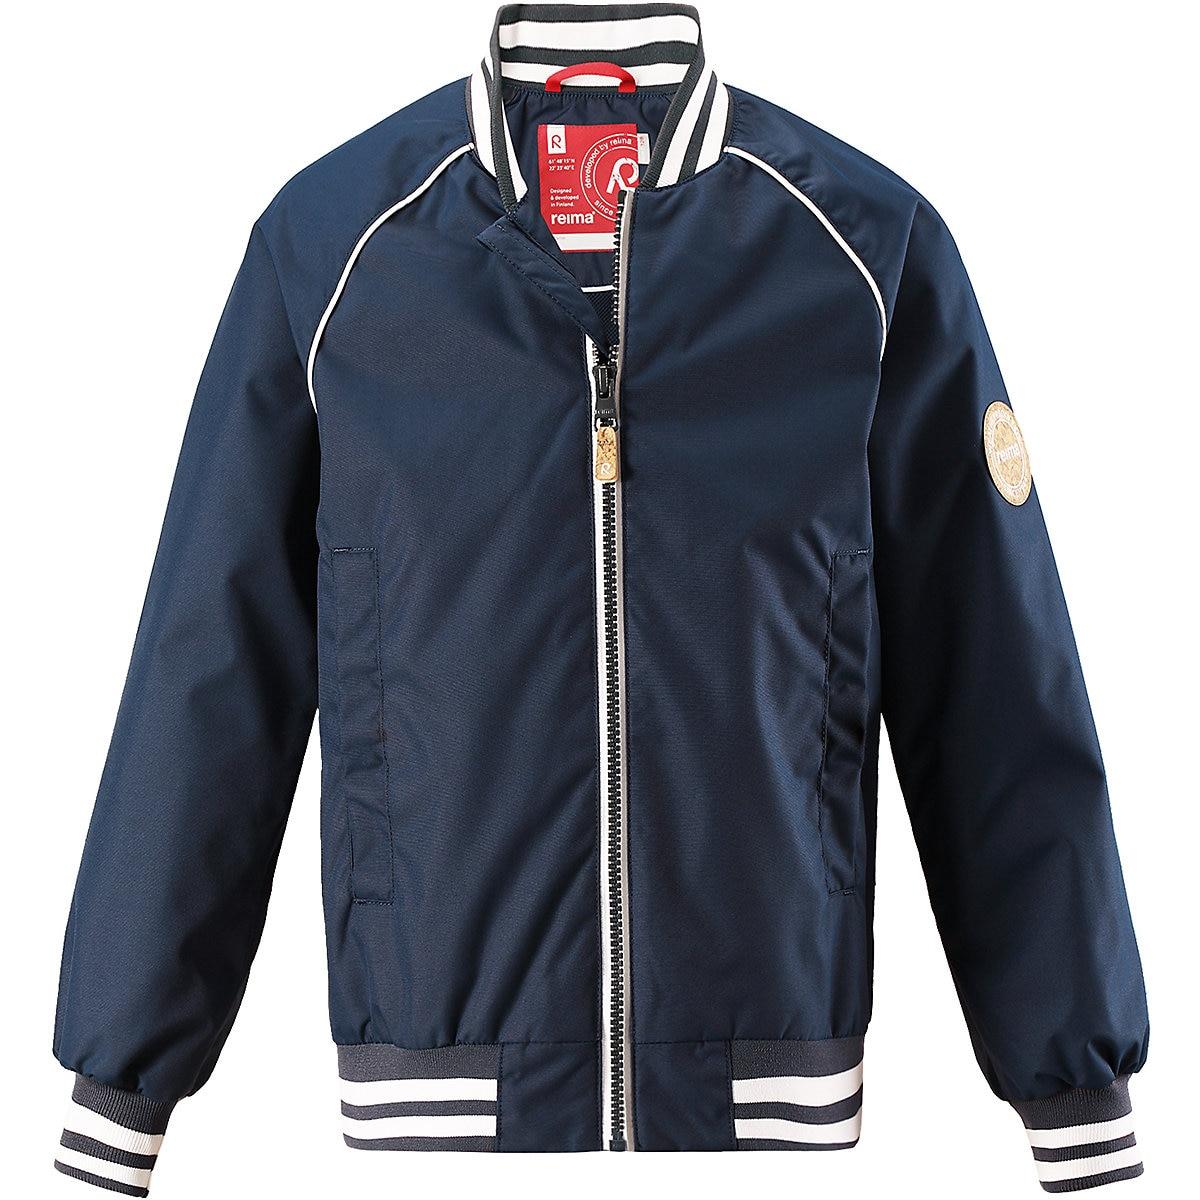 REIMA Jackets & Coats 7632514 for boys baby clothing winter warm boy girl jacket Polyester new fashion newborn baby boy girl romper